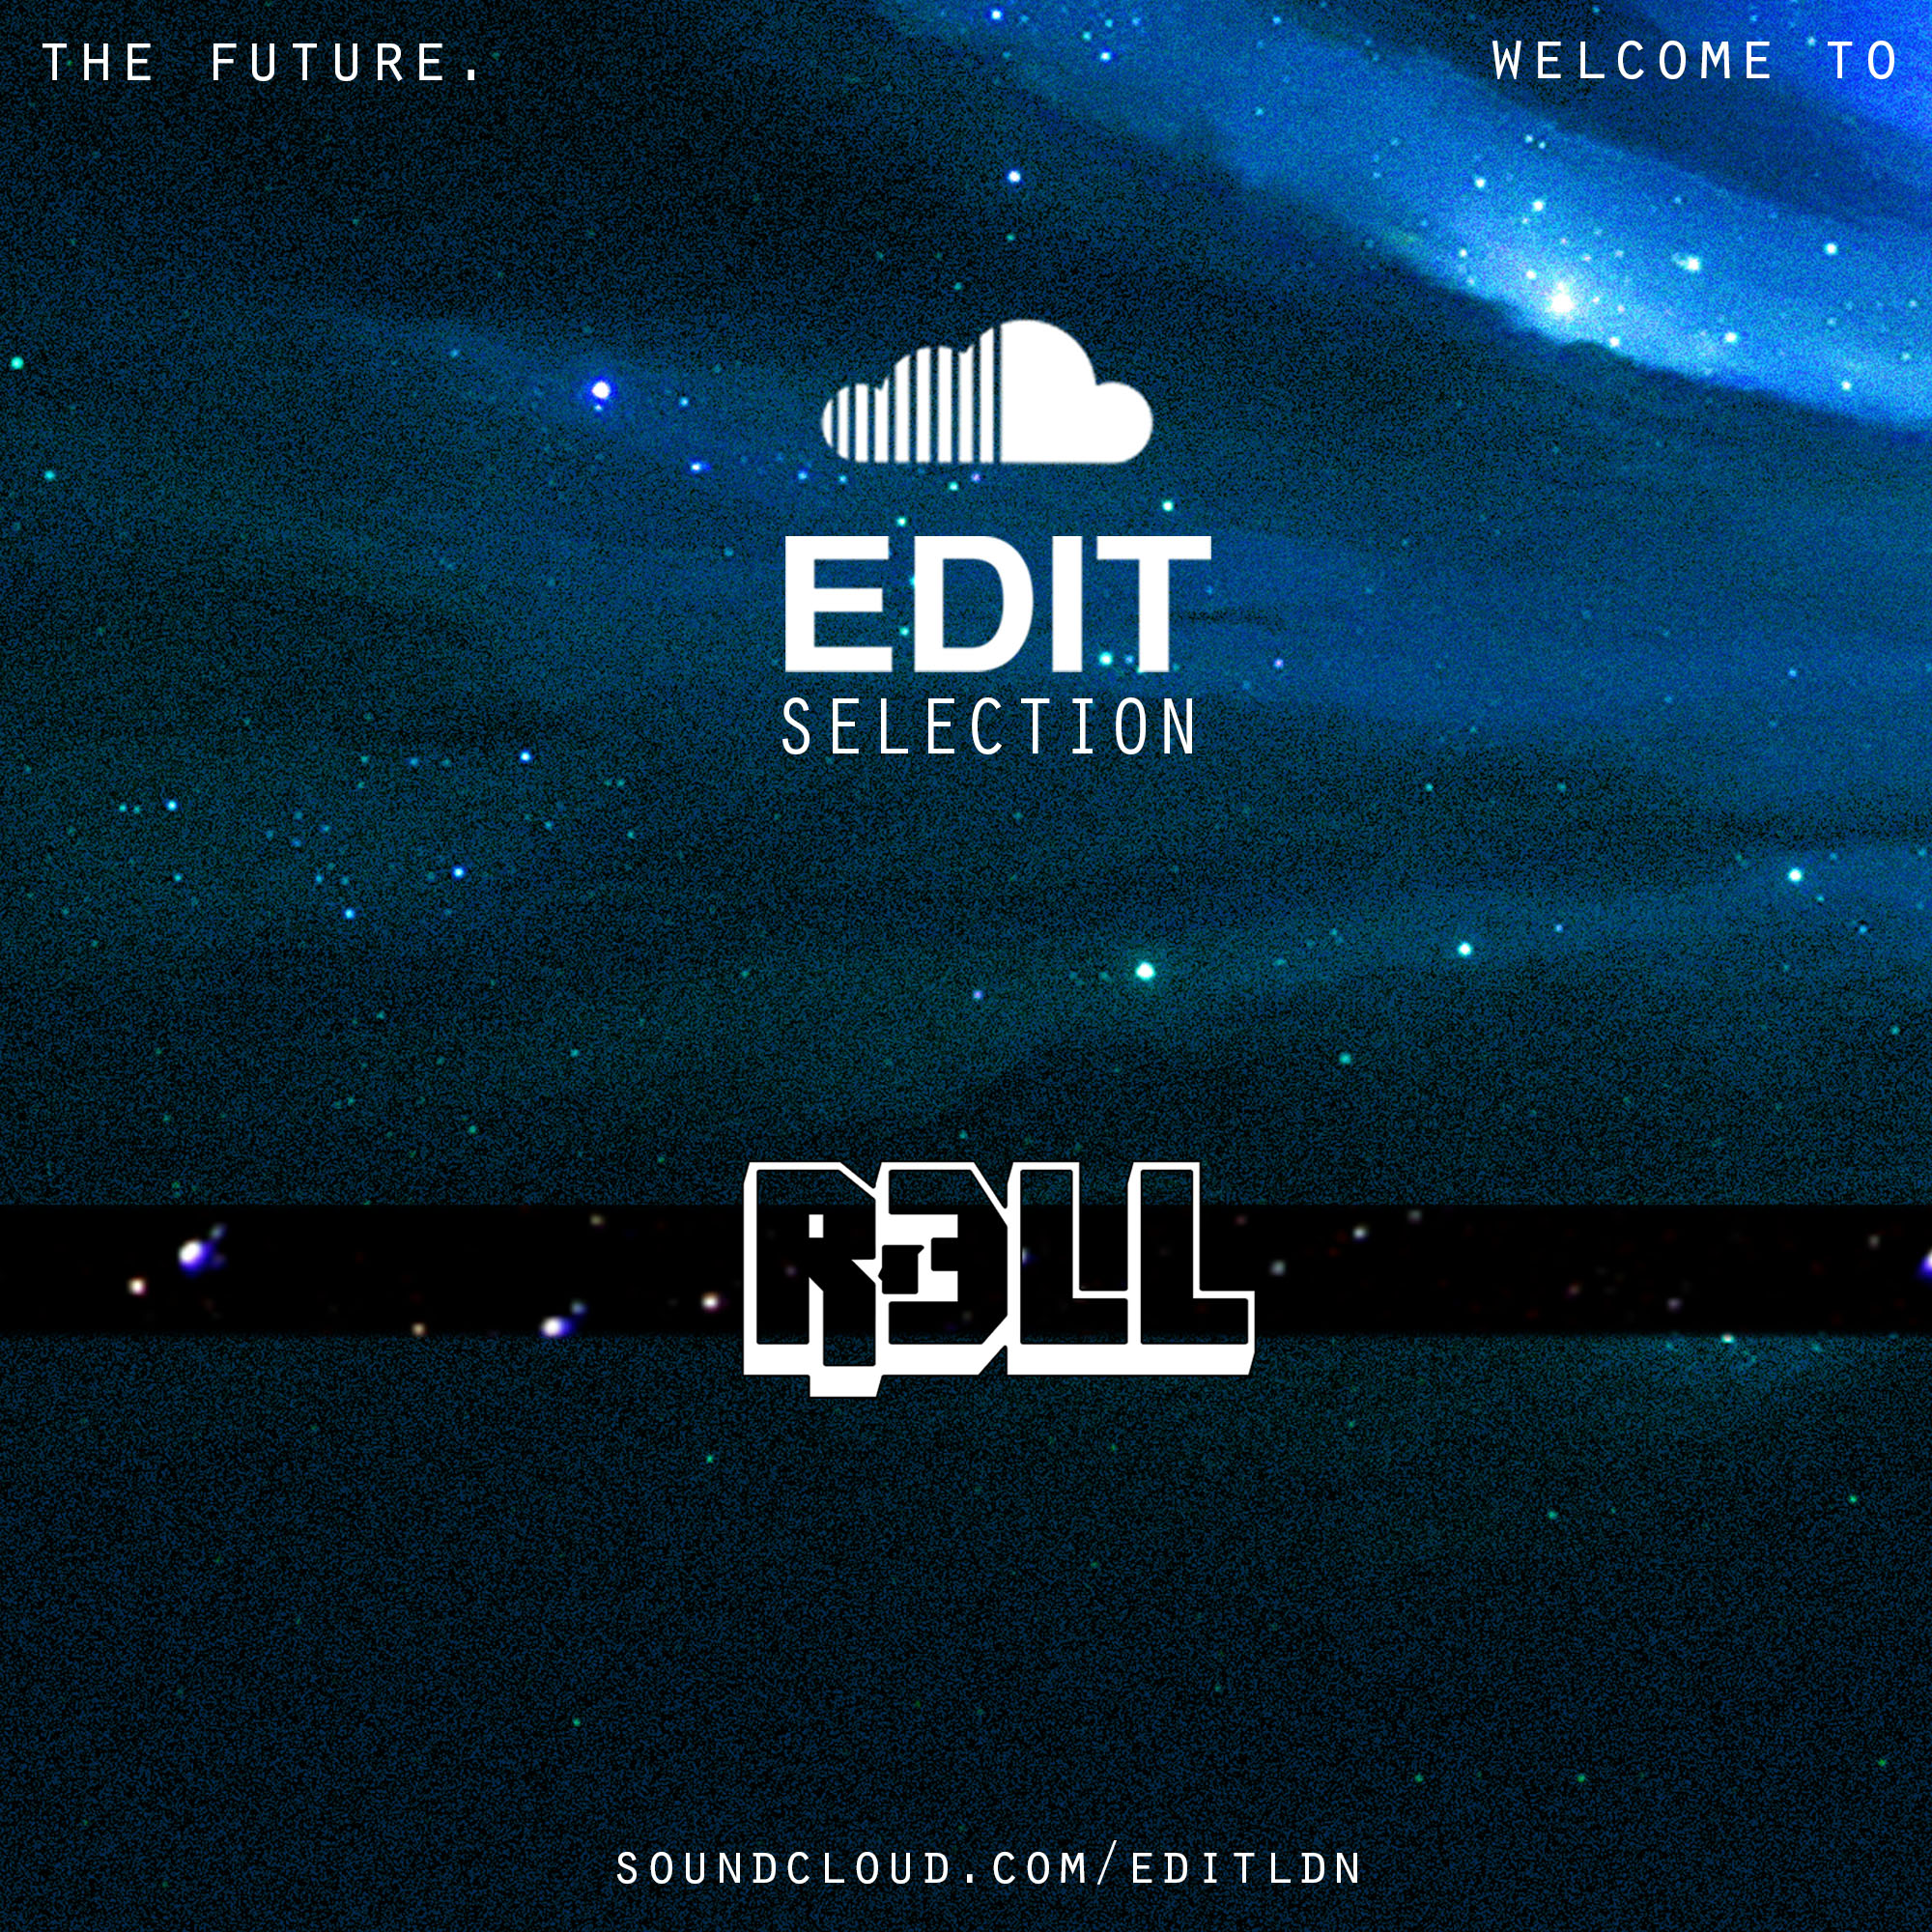 edit-selection-r3ll.jpg